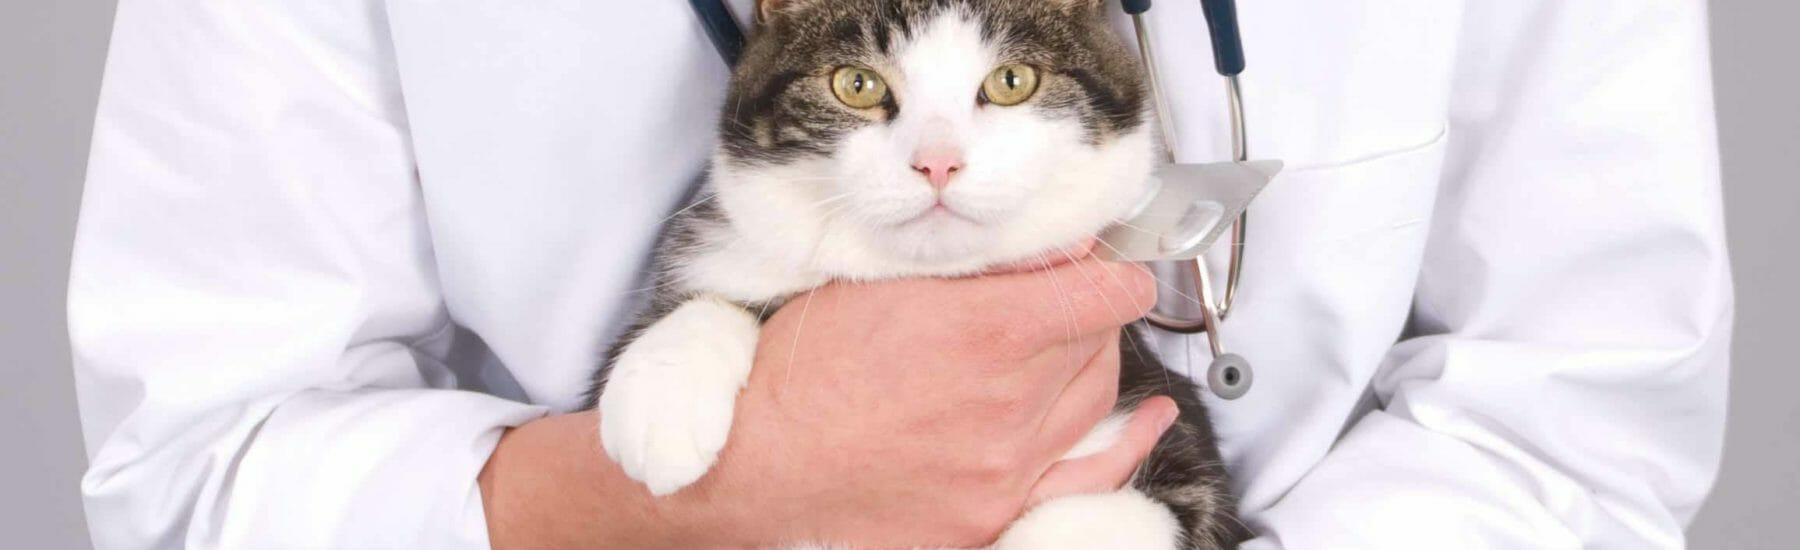 Veterinarian holding a cat